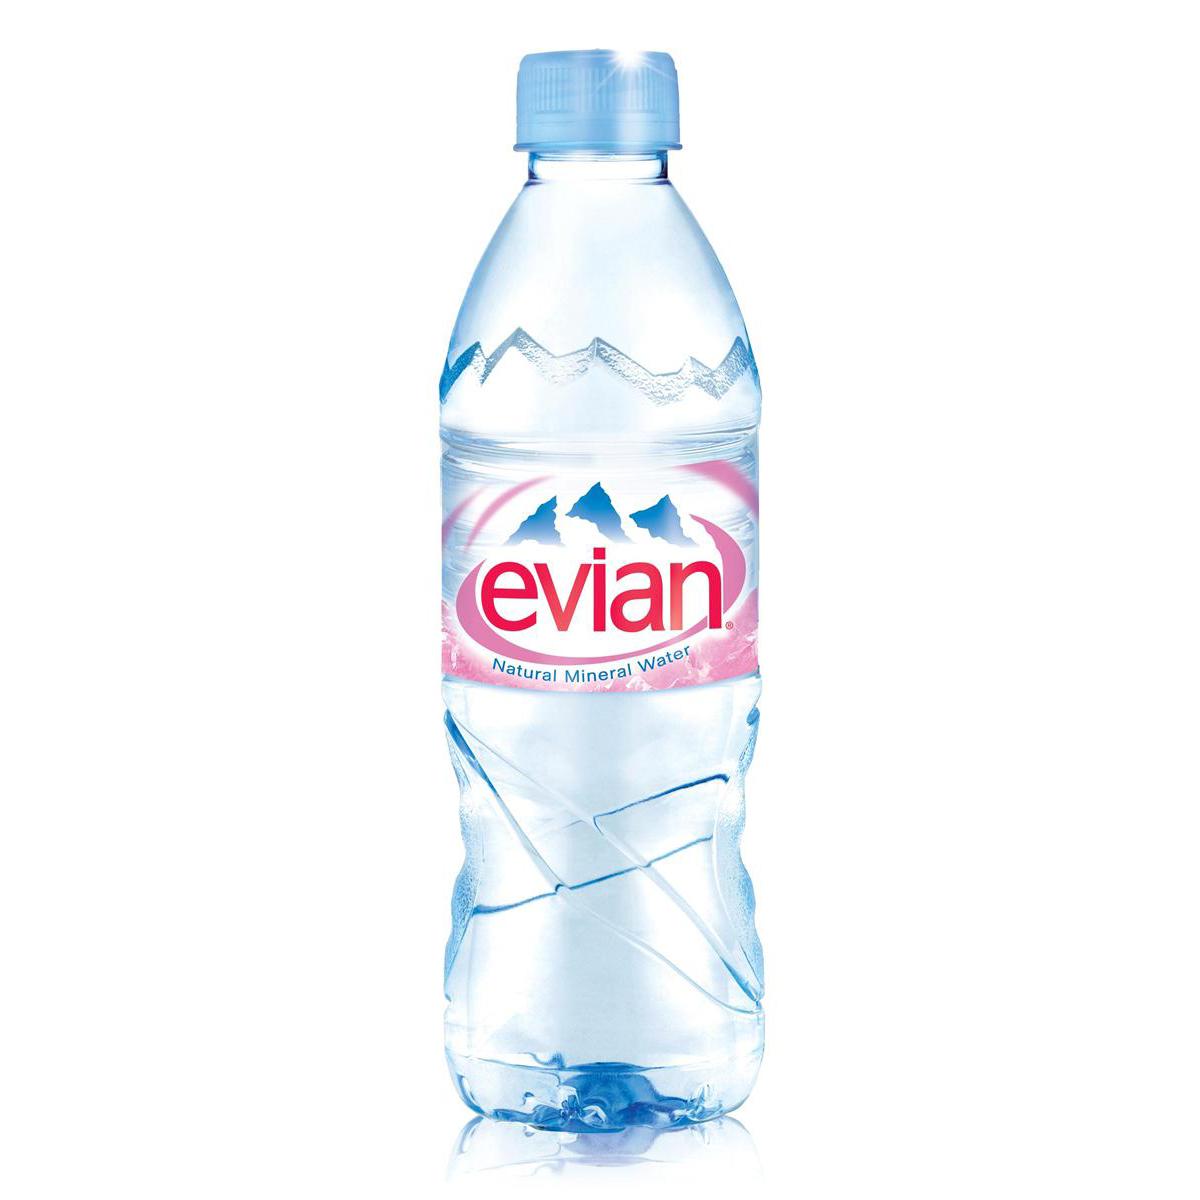 Evian Natural Mineral Water Still Bottle Plastic 500ml Ref 01210 [Pack 24]